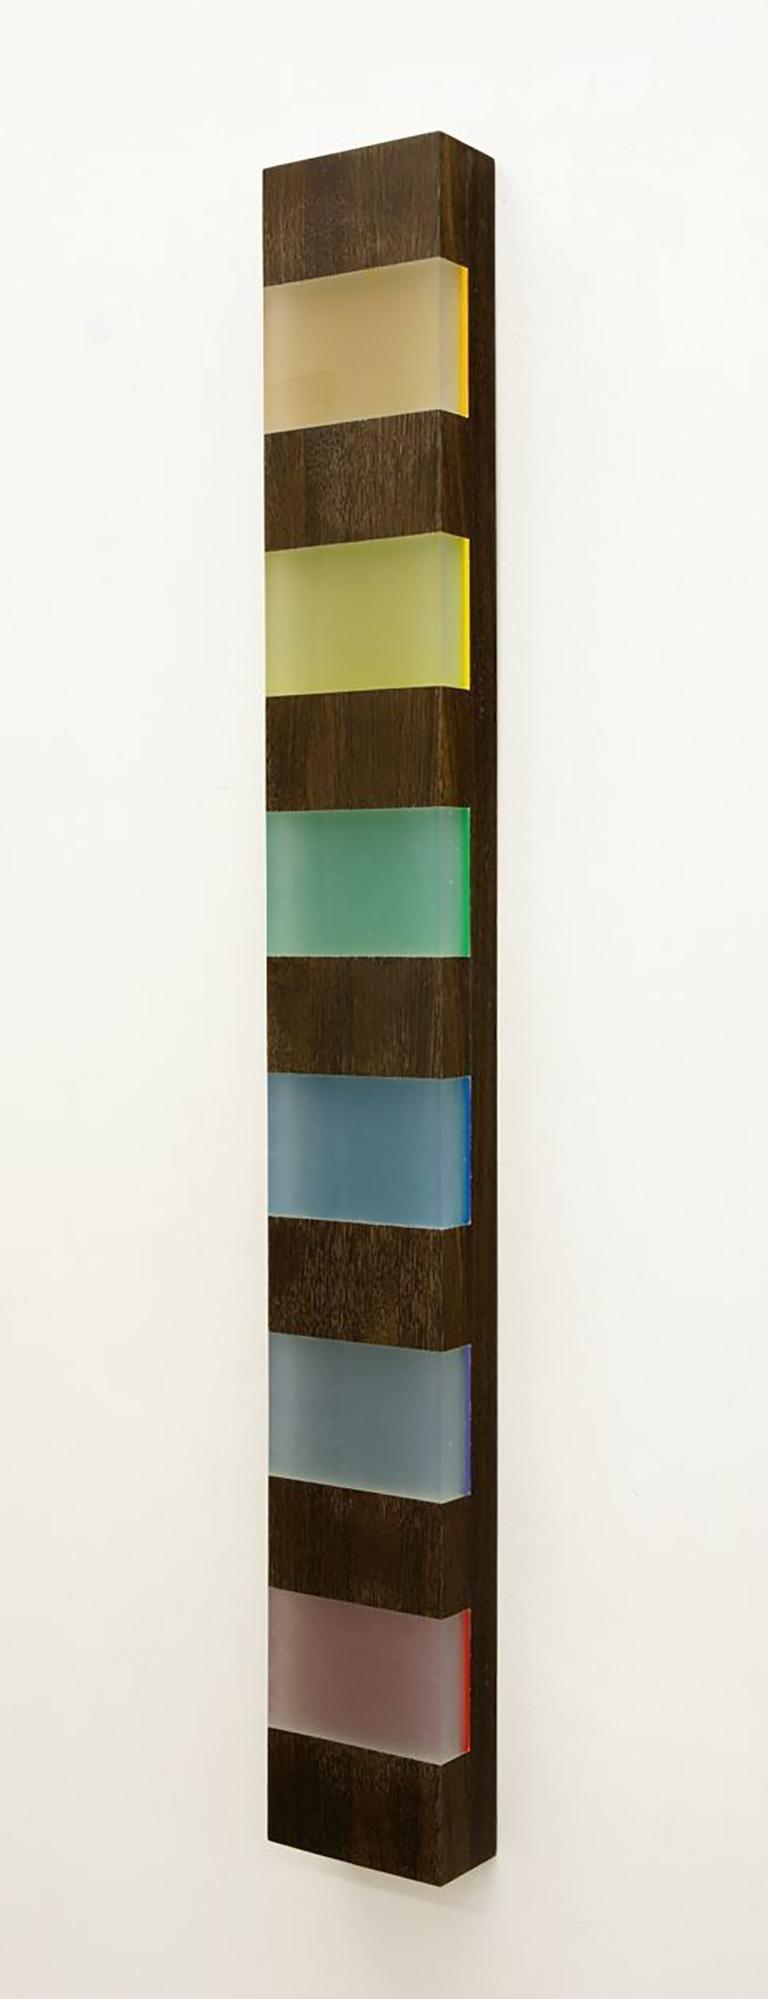 Harald Schmitz-Schmelzer Abstract Sculpture - Donald